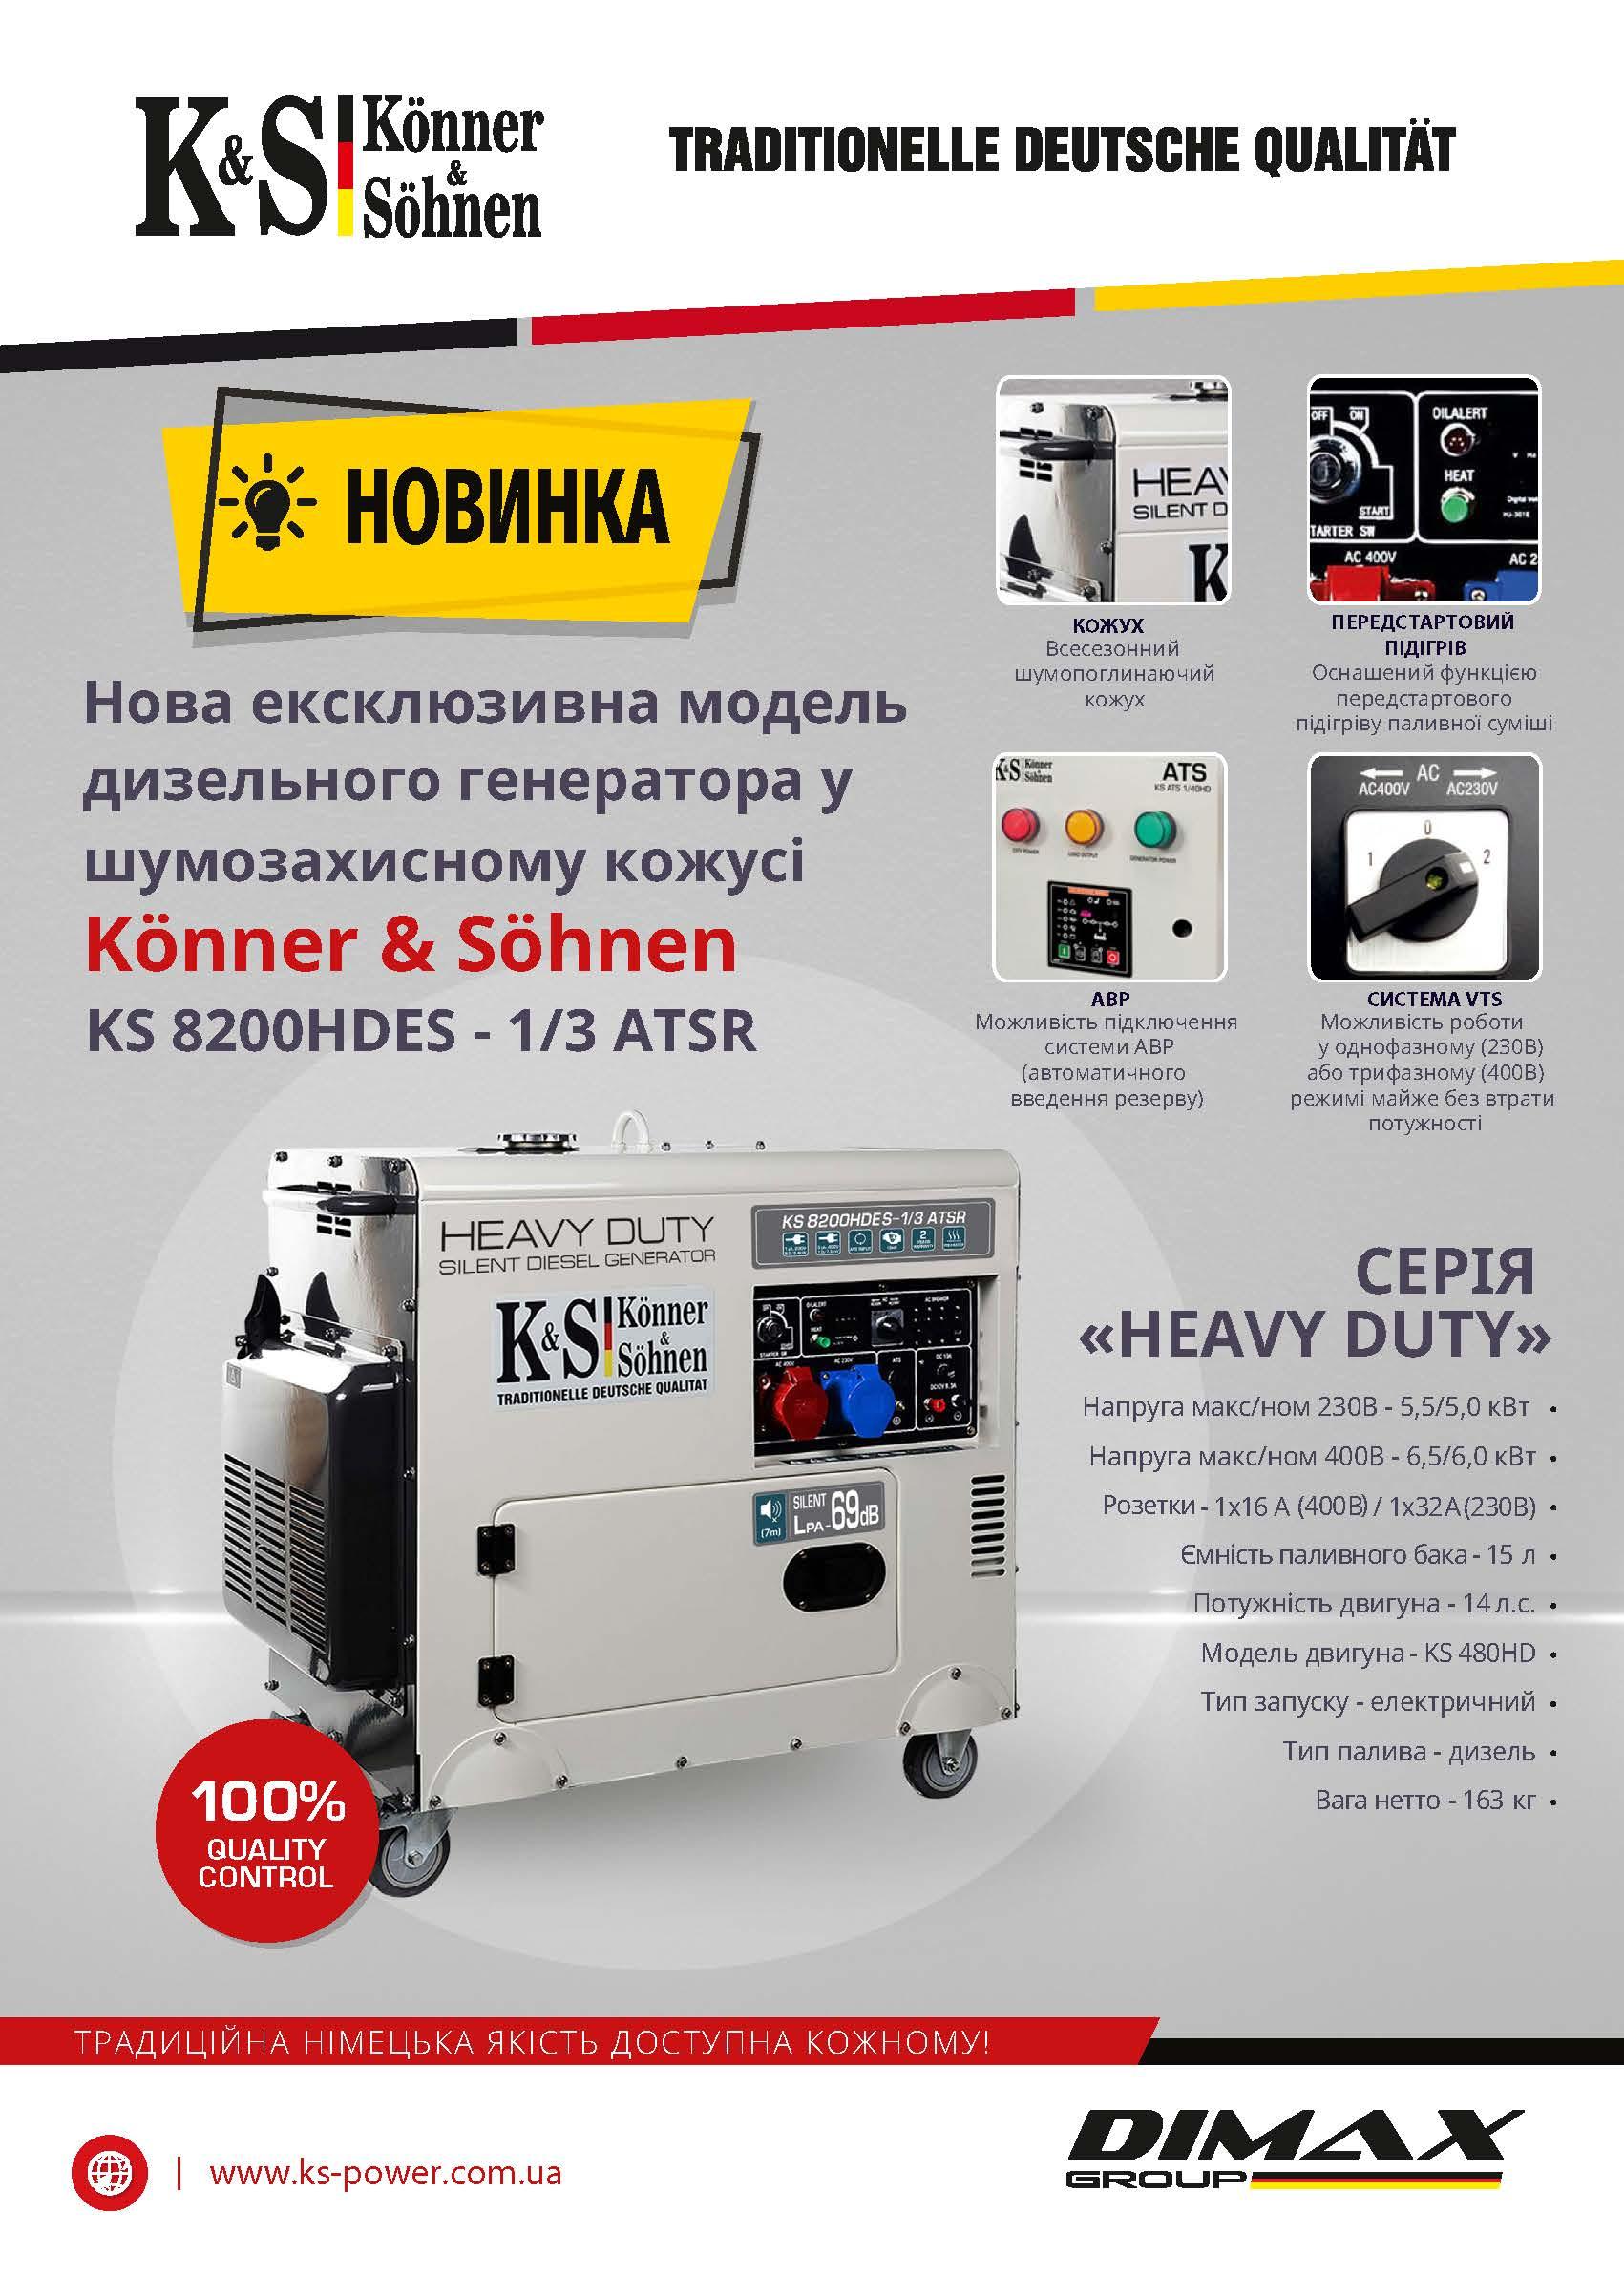 Дизельний генератор у шумозахисному кожусі Könner & Söhnen KS 8200HDES - 1/3 ATSR